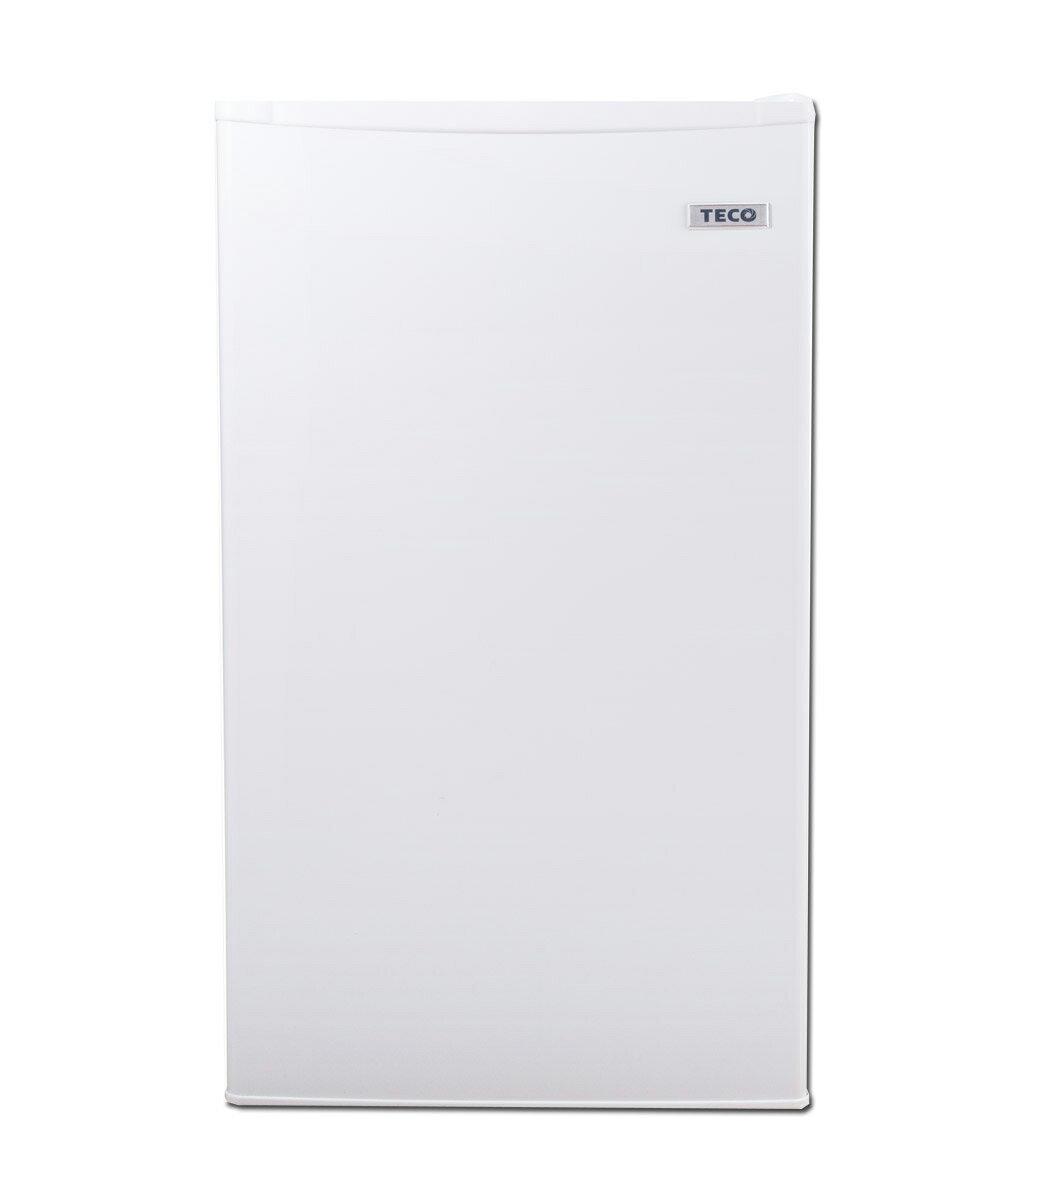 【TECO東元】99公升單門小鮮綠冰箱 R1091W 1